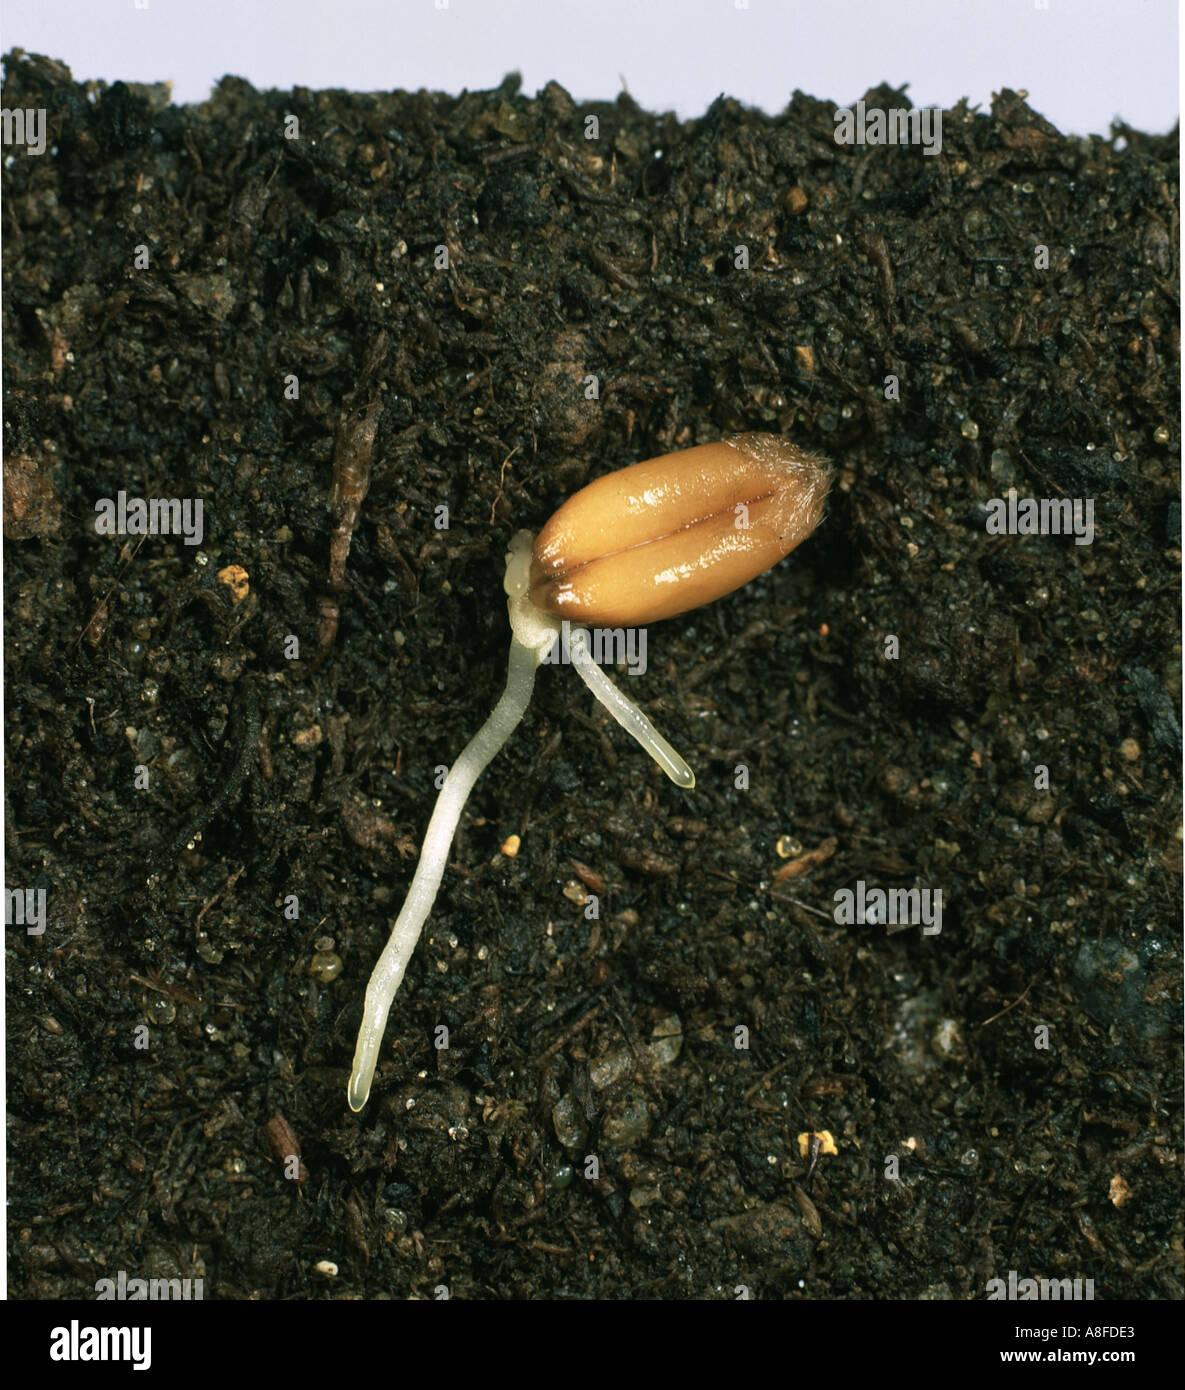 Monocot Seed Stock Photos & Monocot Seed Stock Images - Alamy